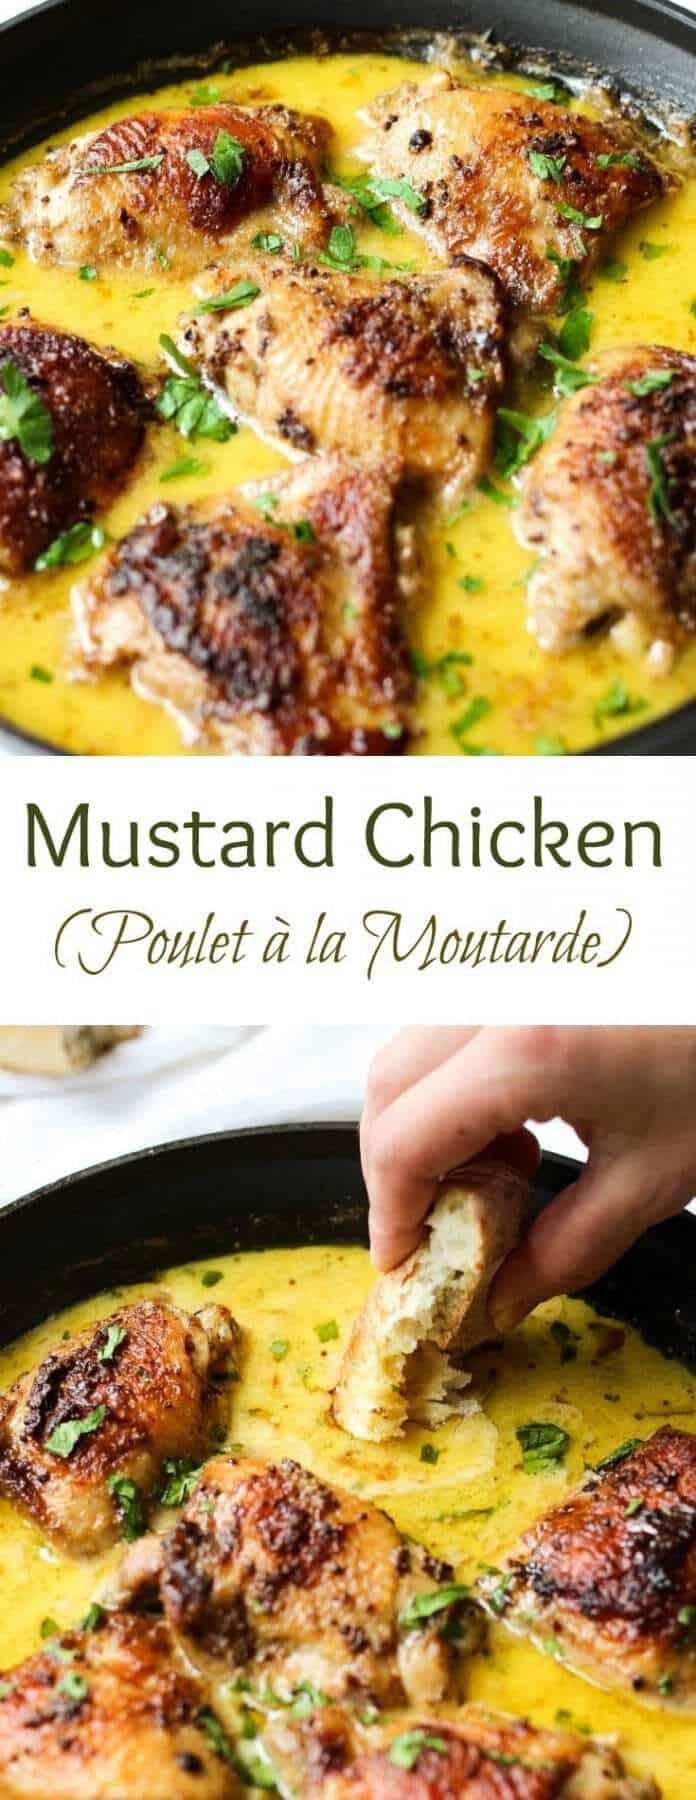 Mustard Chicken | Creamy Mustard Chicken | Mustard Chicken Recipe | Creamy Mustard Chicken Comfort Food